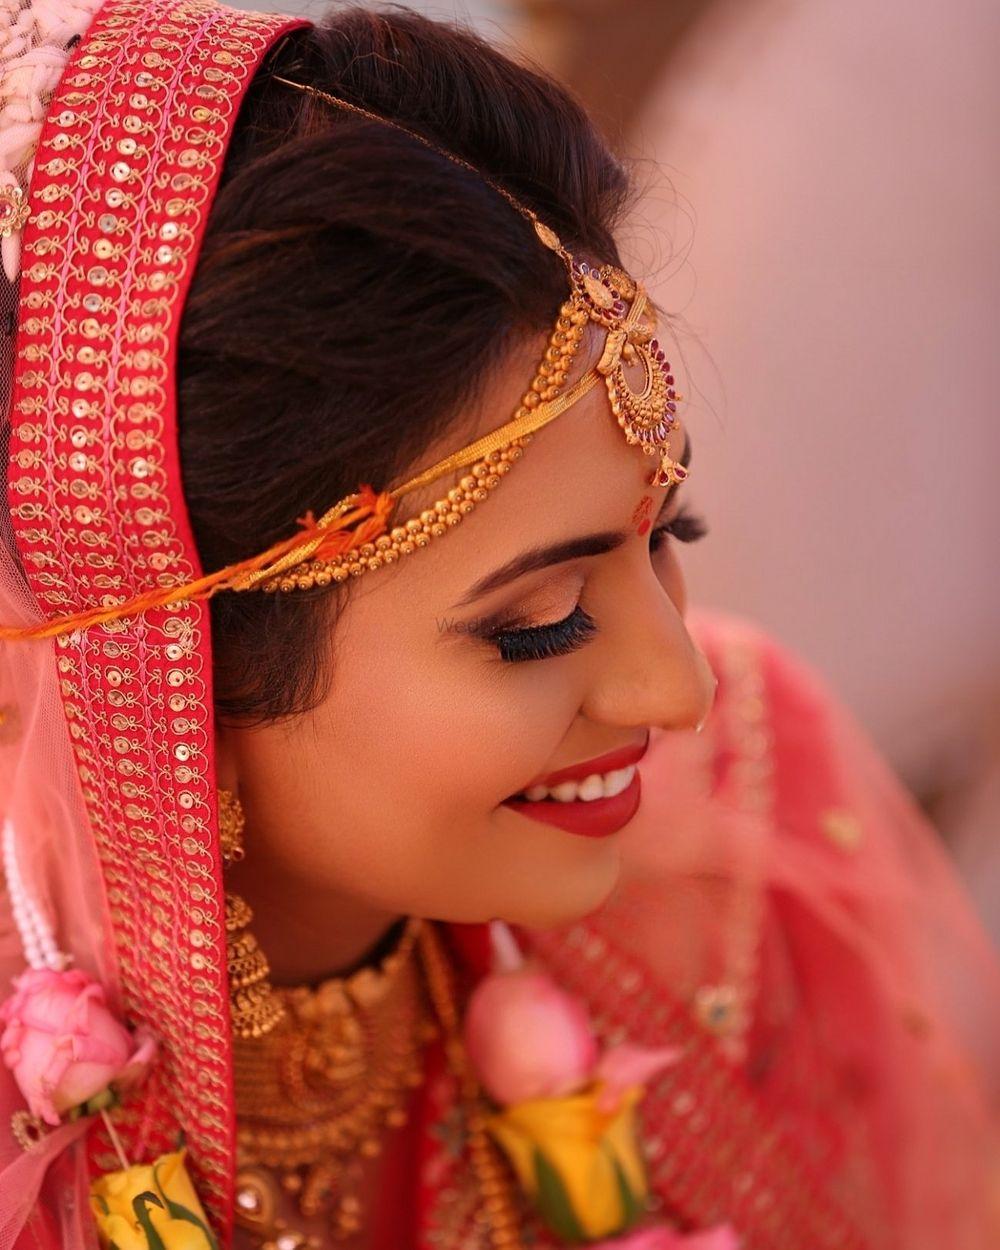 Photo From Chhavi bansal - By Shab's Beauty Salon & Bridal Studio